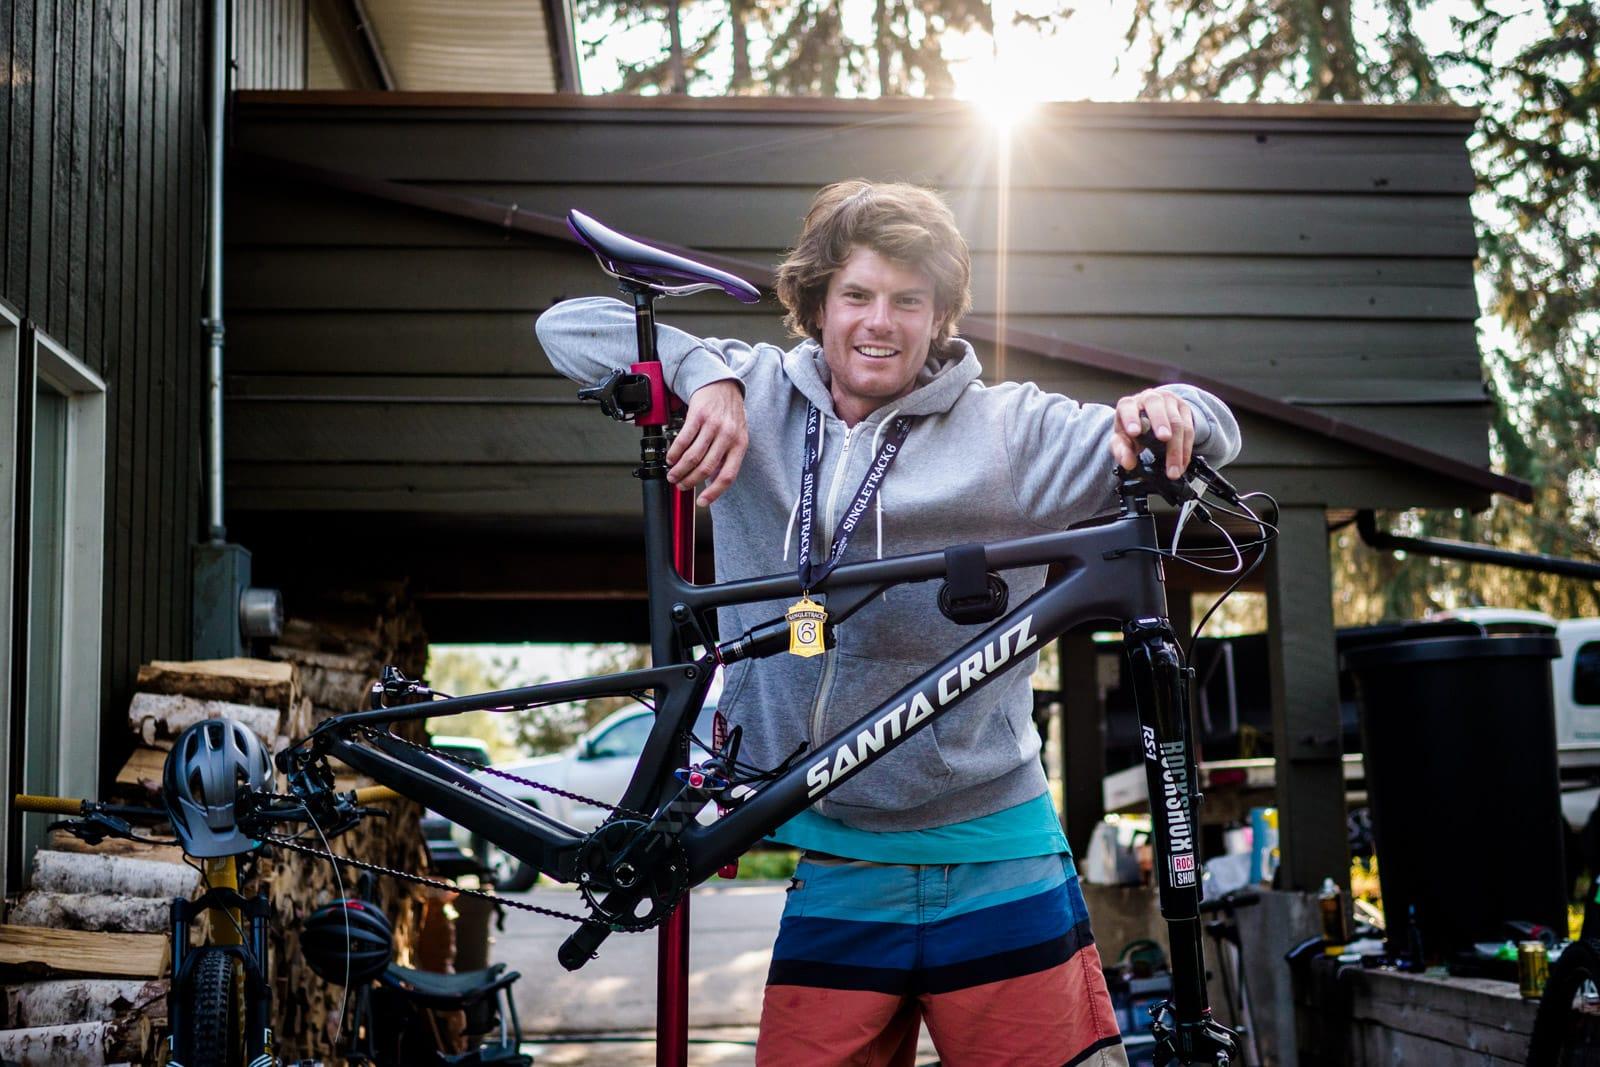 Santa Cruz Bicycles - Chris Johnston and His New Blur at Singletrack6